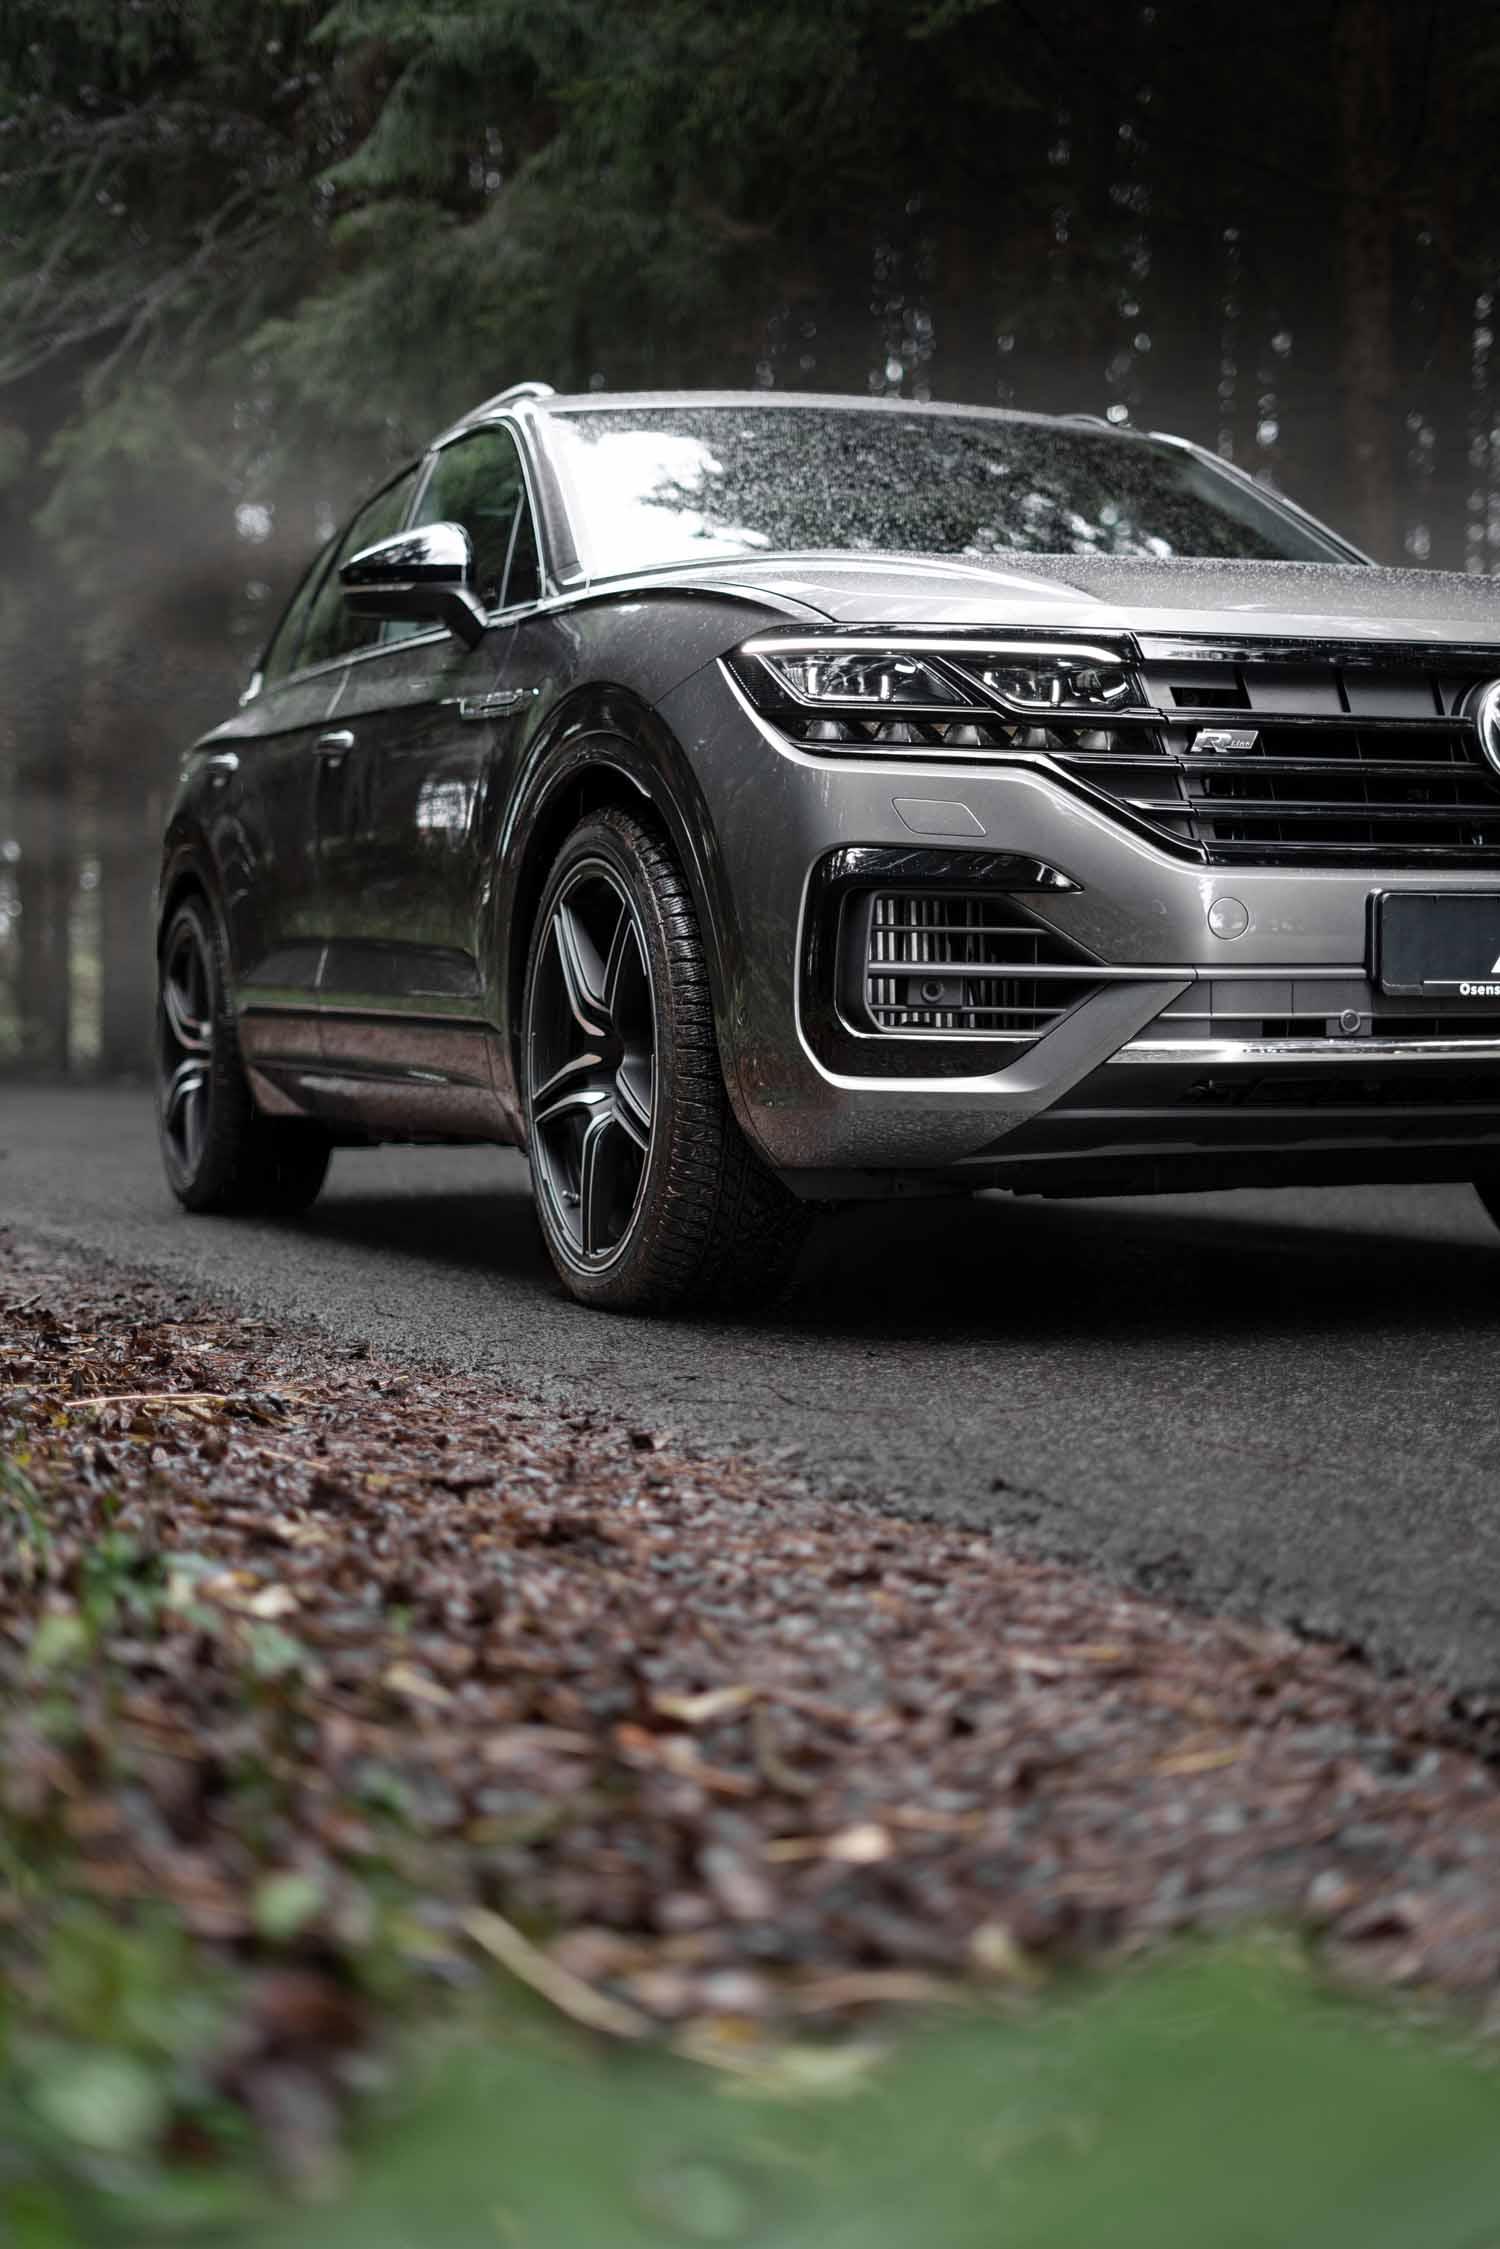 VW_Touareg_grey_FR22-8